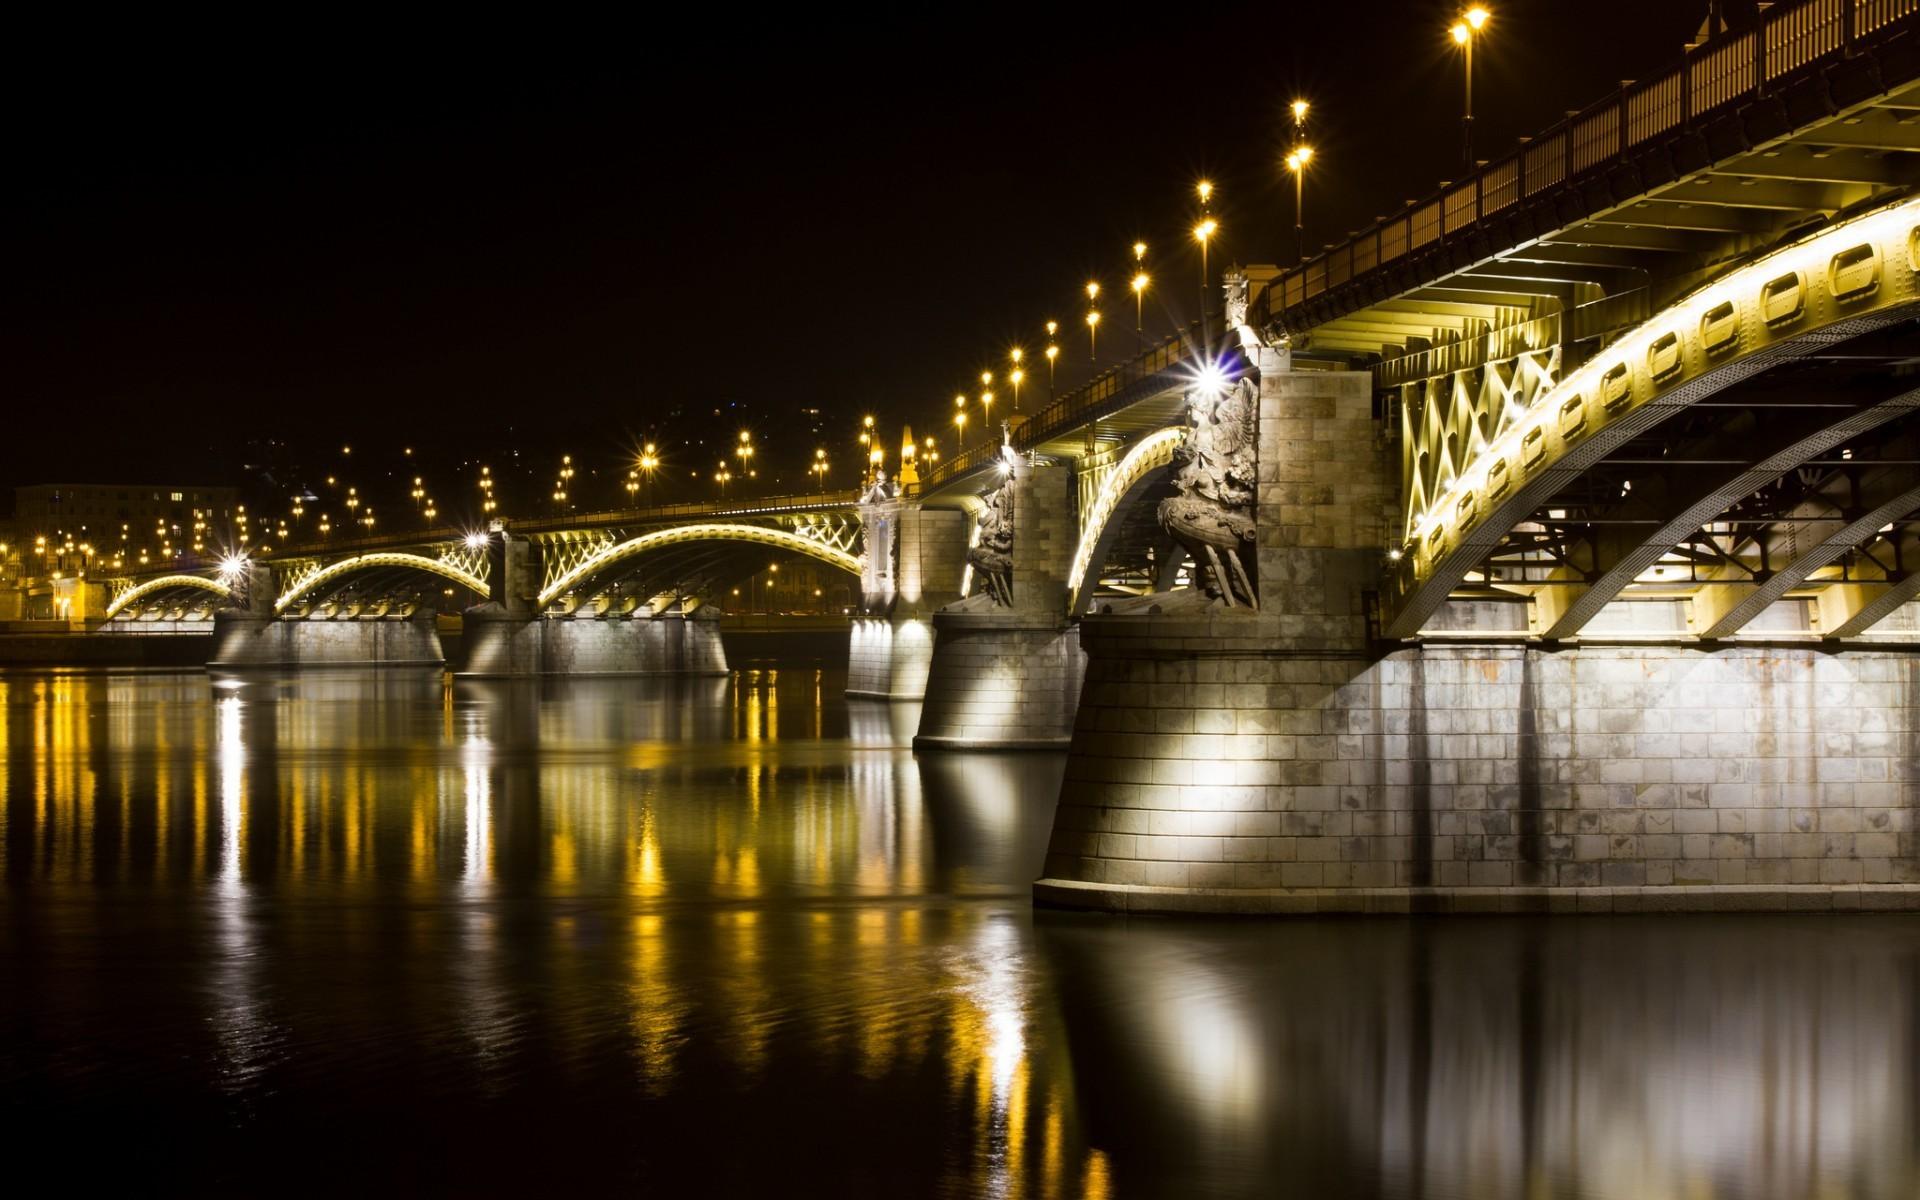 Fabulous bridge at night wallpaper 8763 1920x1200